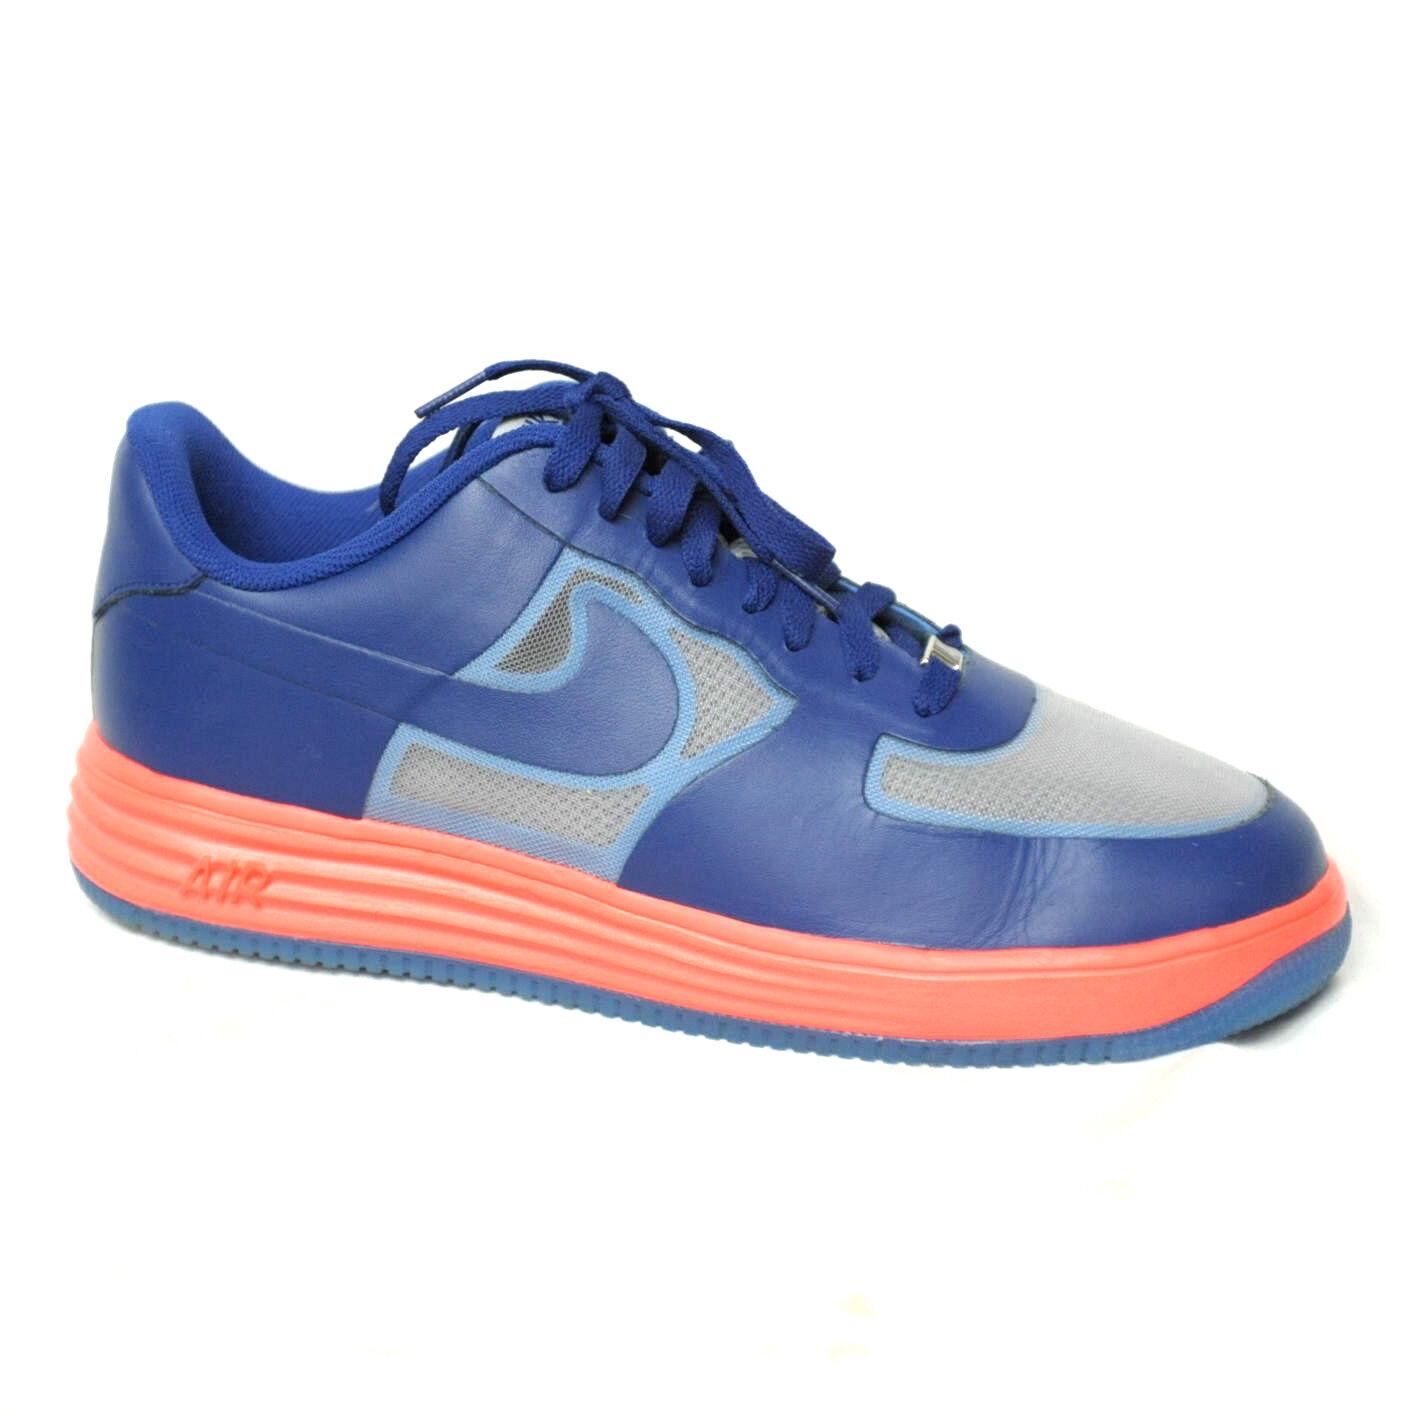 2013 Nike LUNAR AIR FORCE 1 Men's Size 11.5 US